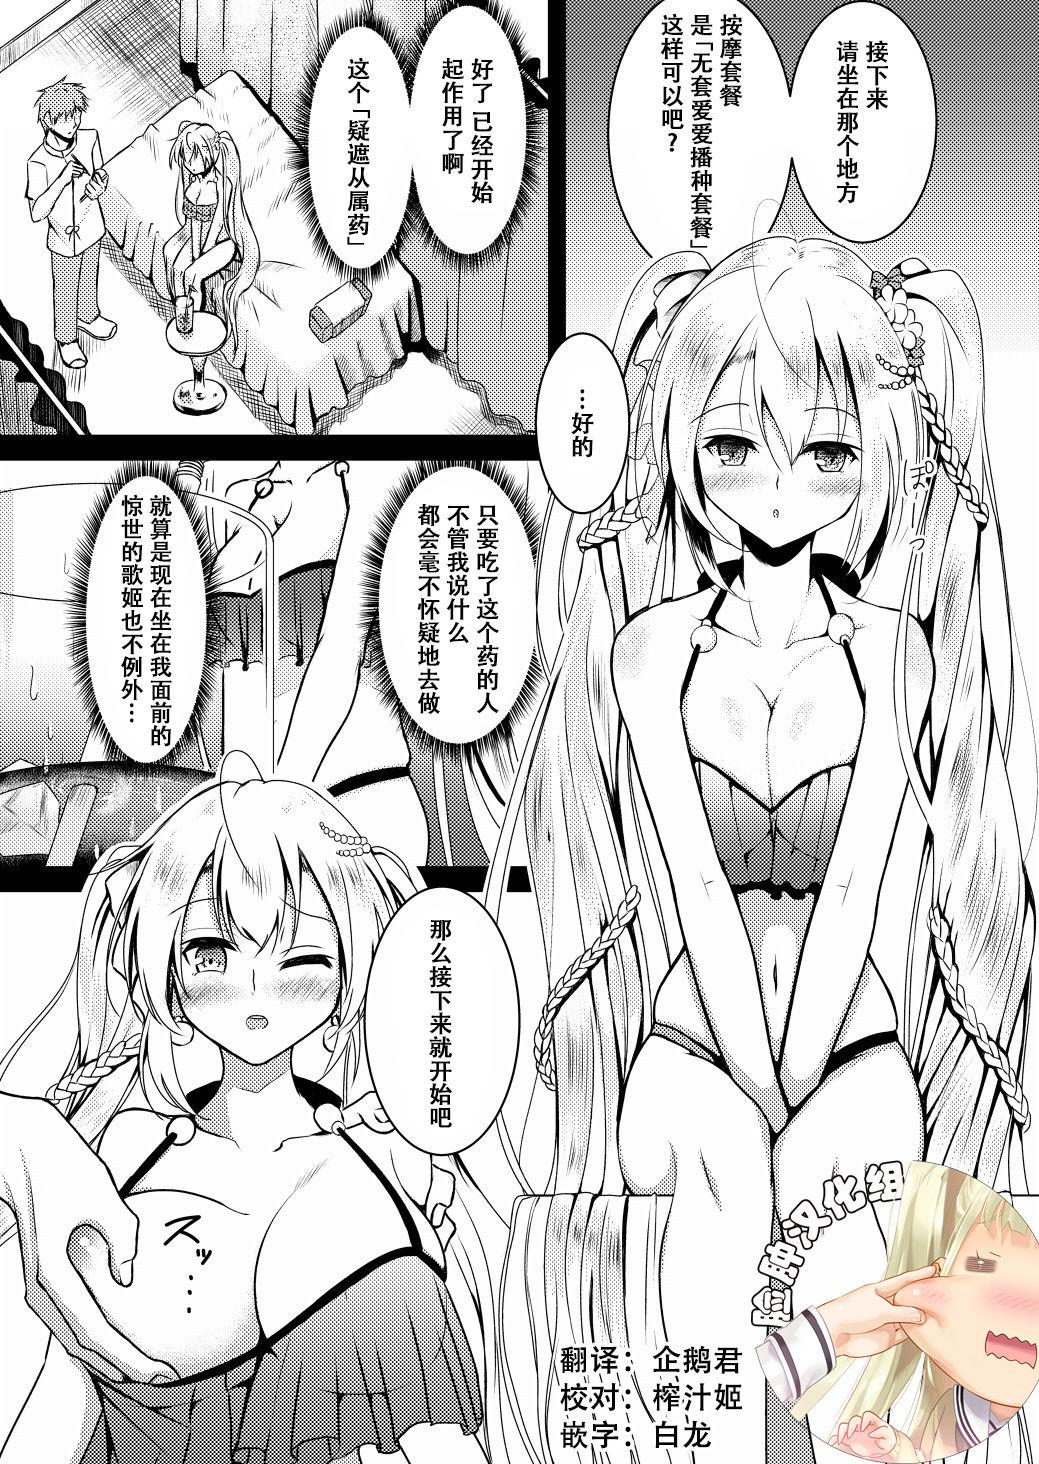 Raindear no Mijikai Ero Manga 0